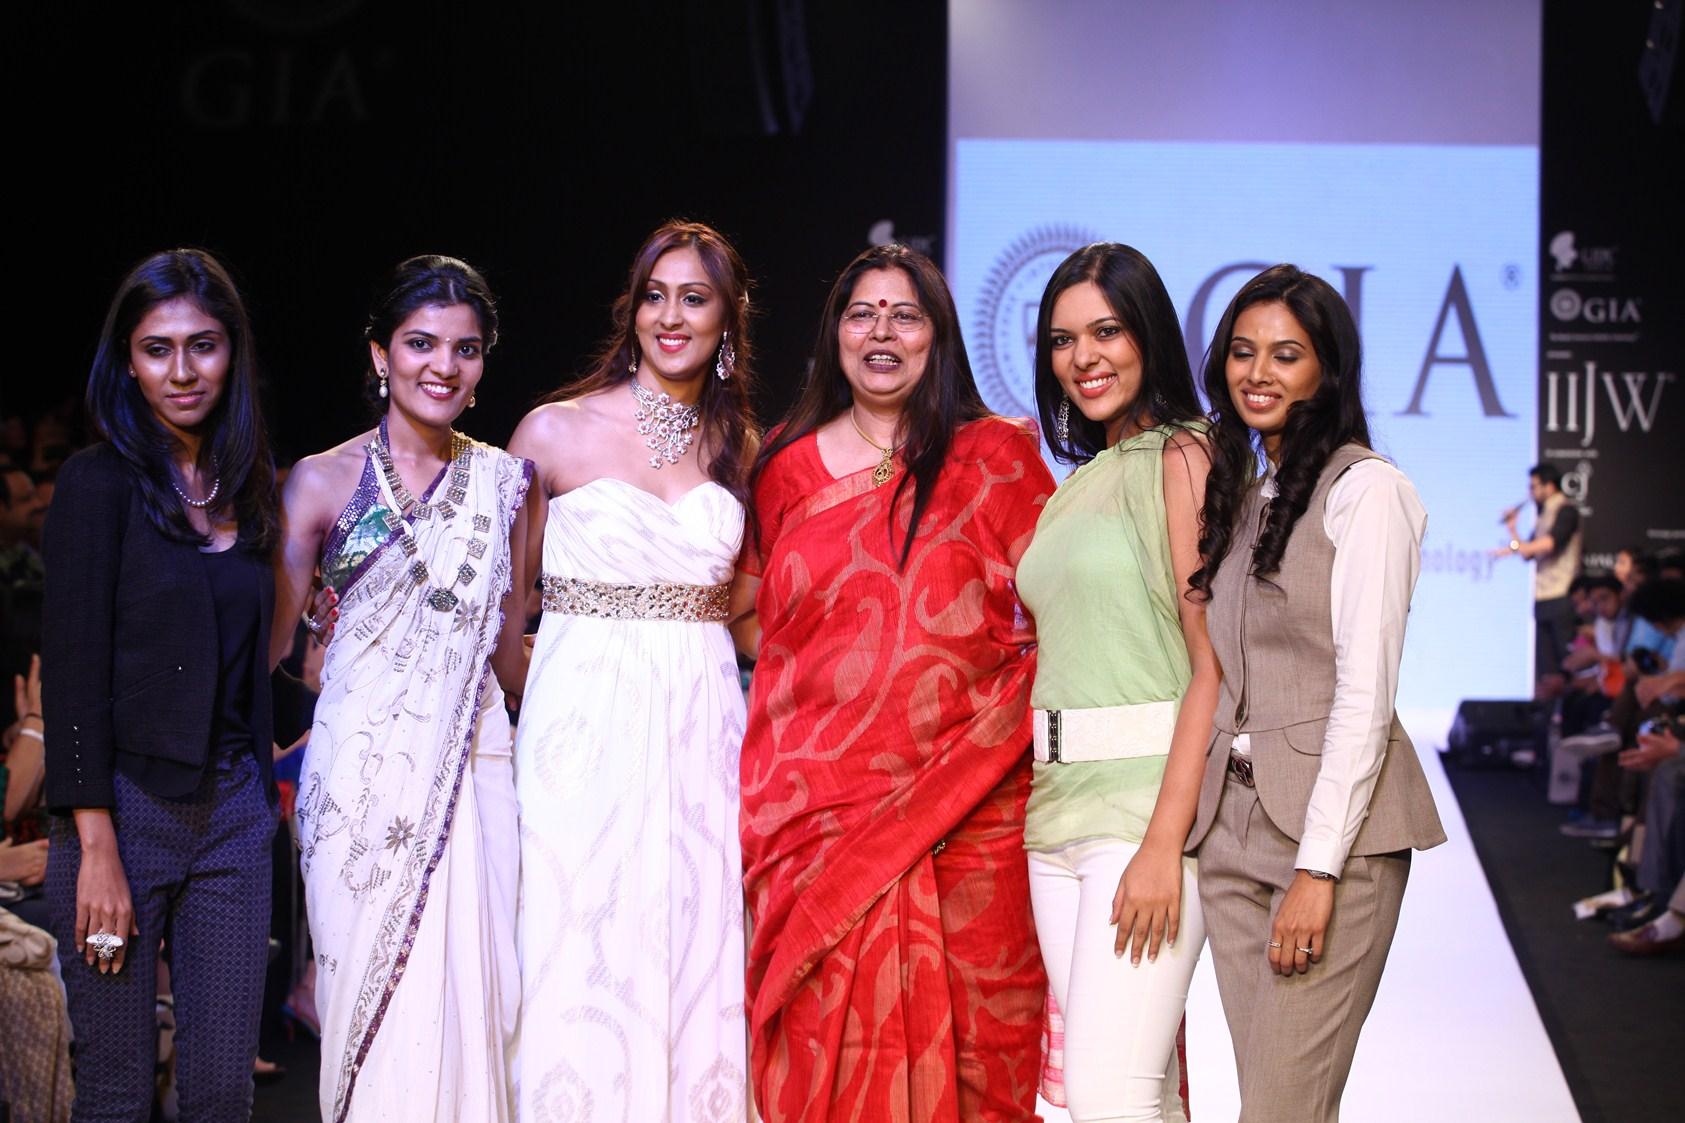 Garima Dixit, Bhumika Selvadia, Nikki Arora, Nirupa Bhatt, Shraddha Agarwal, Jayshree Thakur